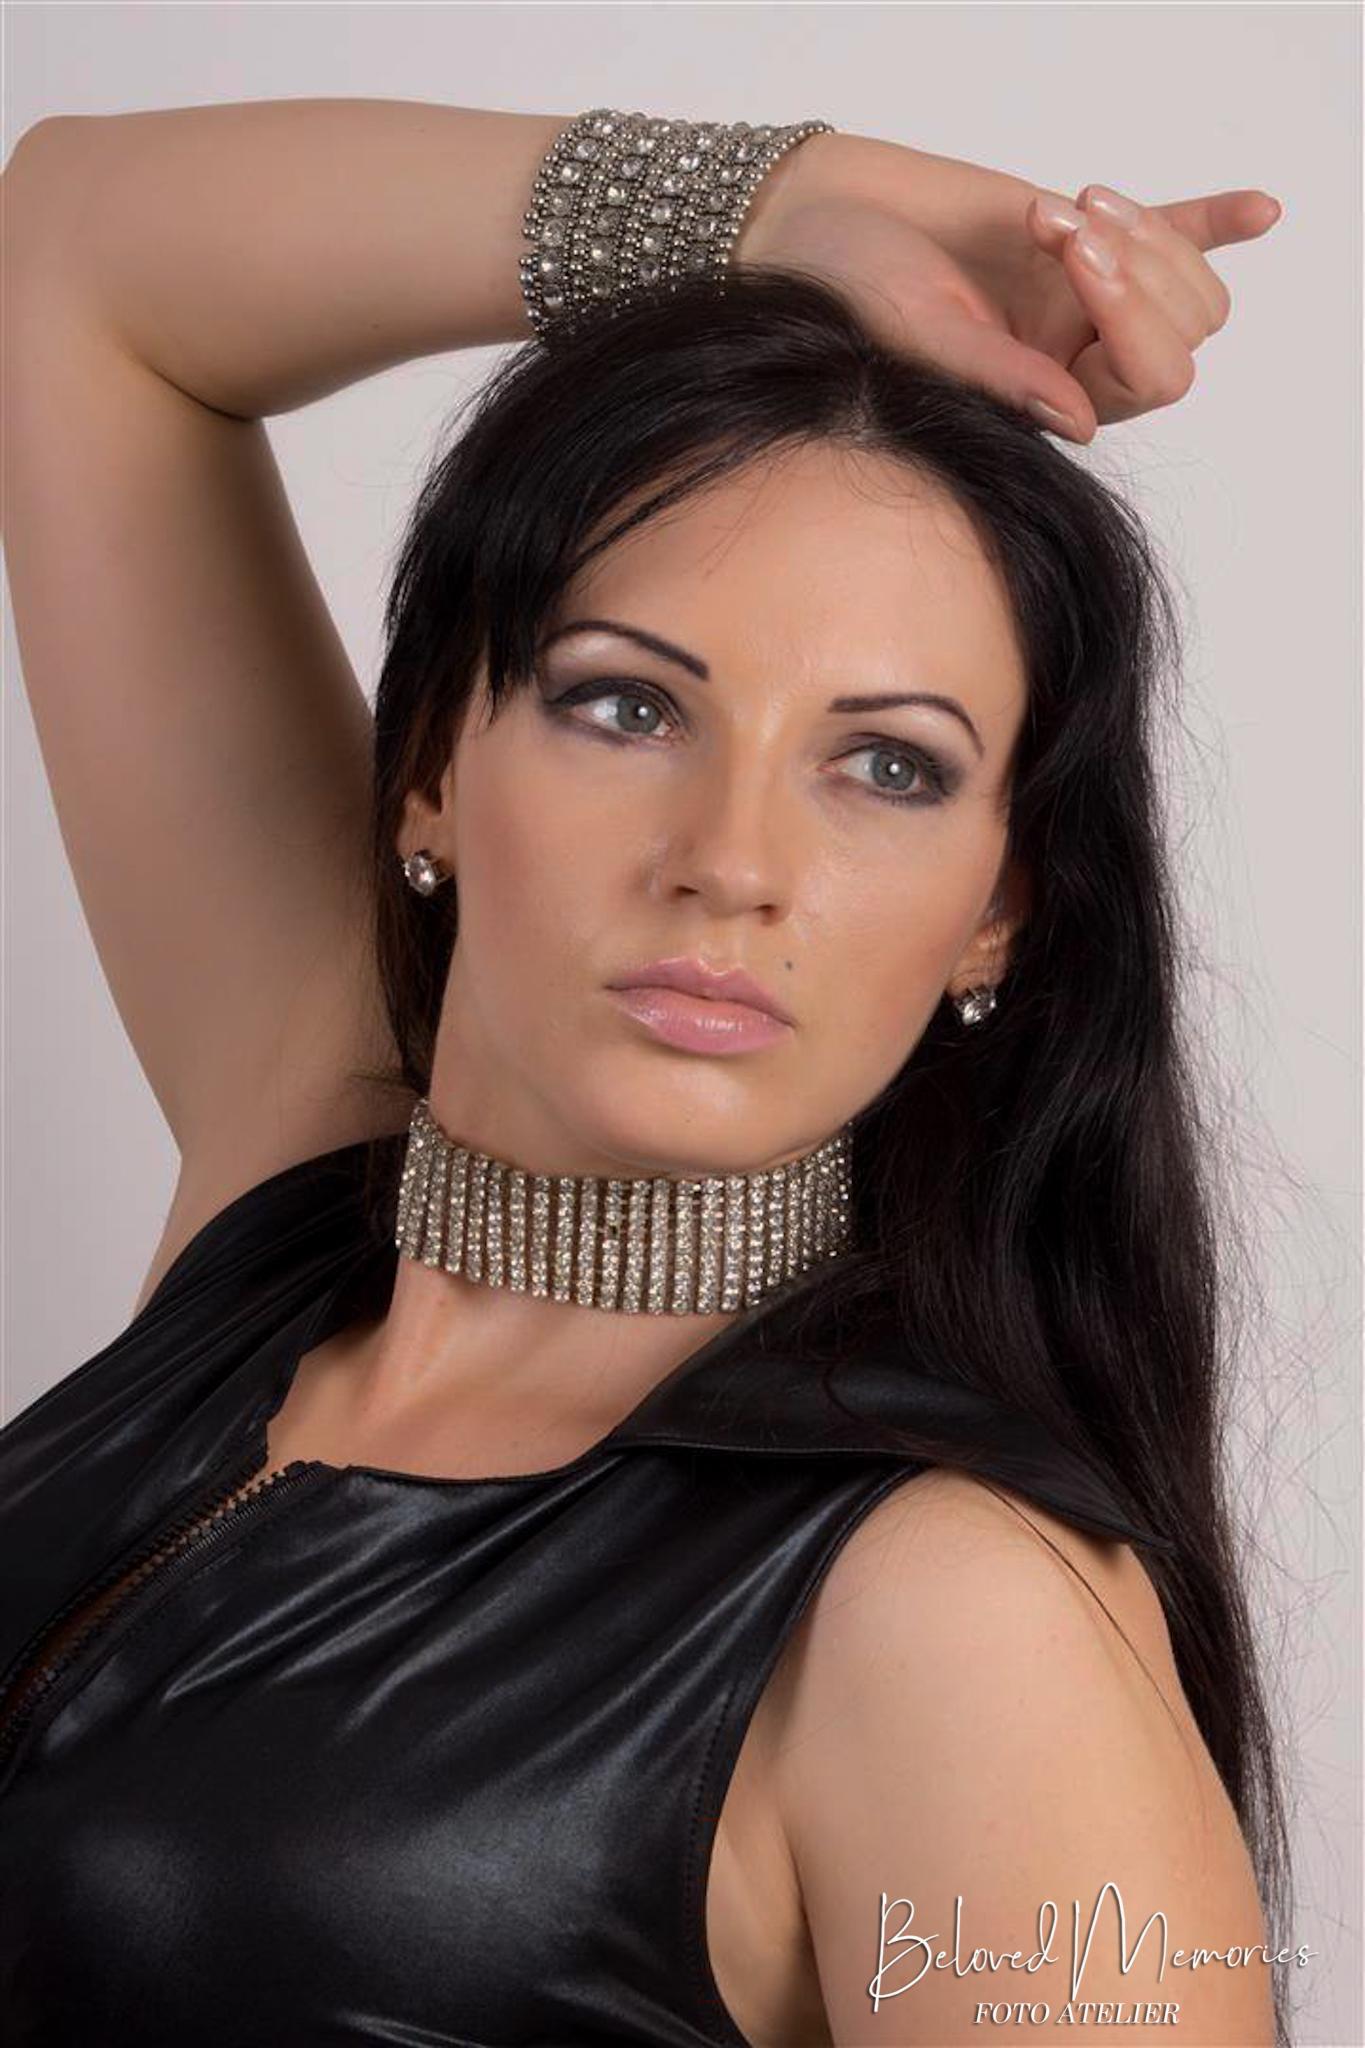 Portret met model Ewa